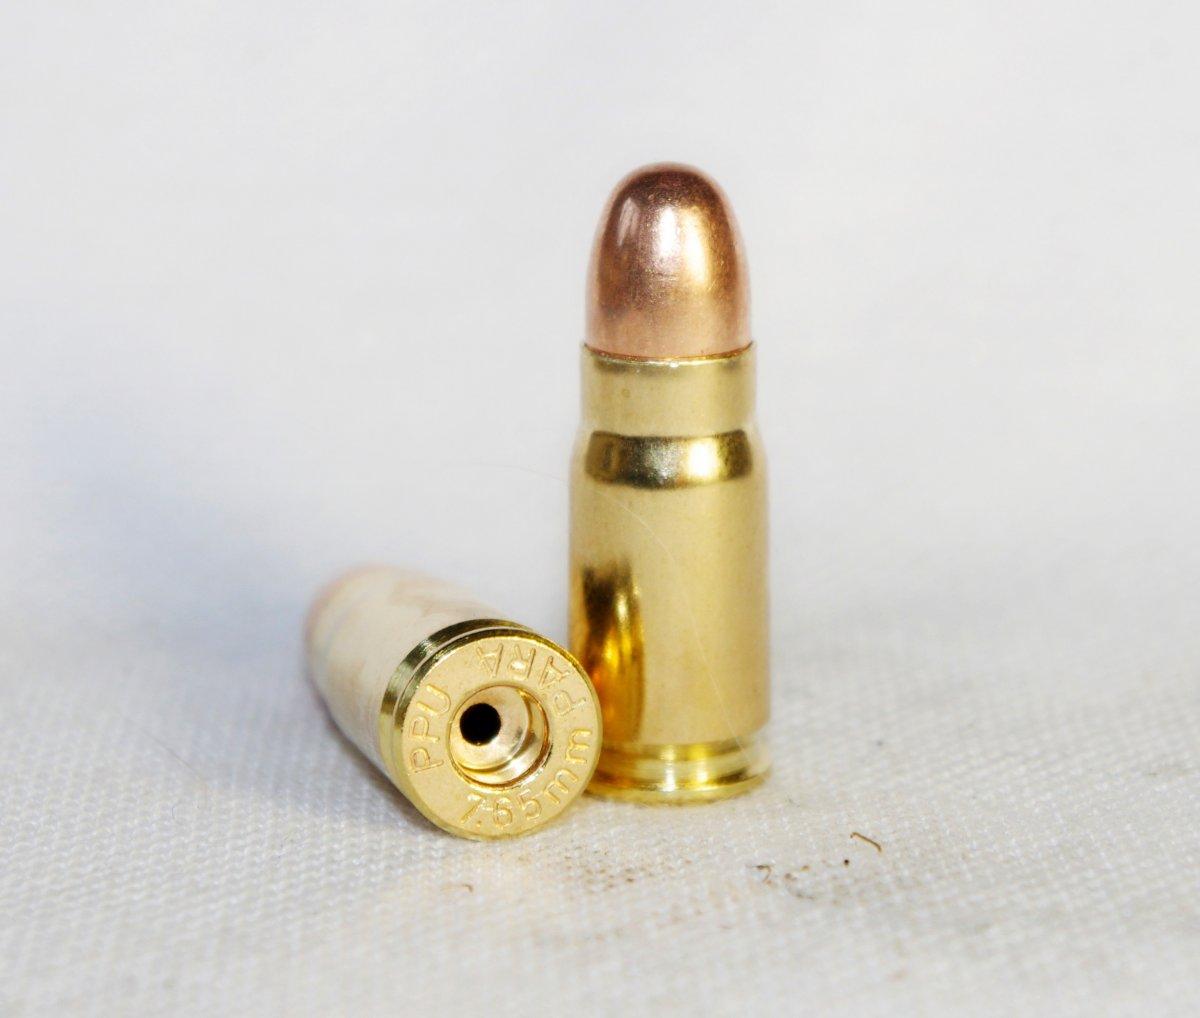 9 × 19 мм парабеллум - 9×19mm parabellum